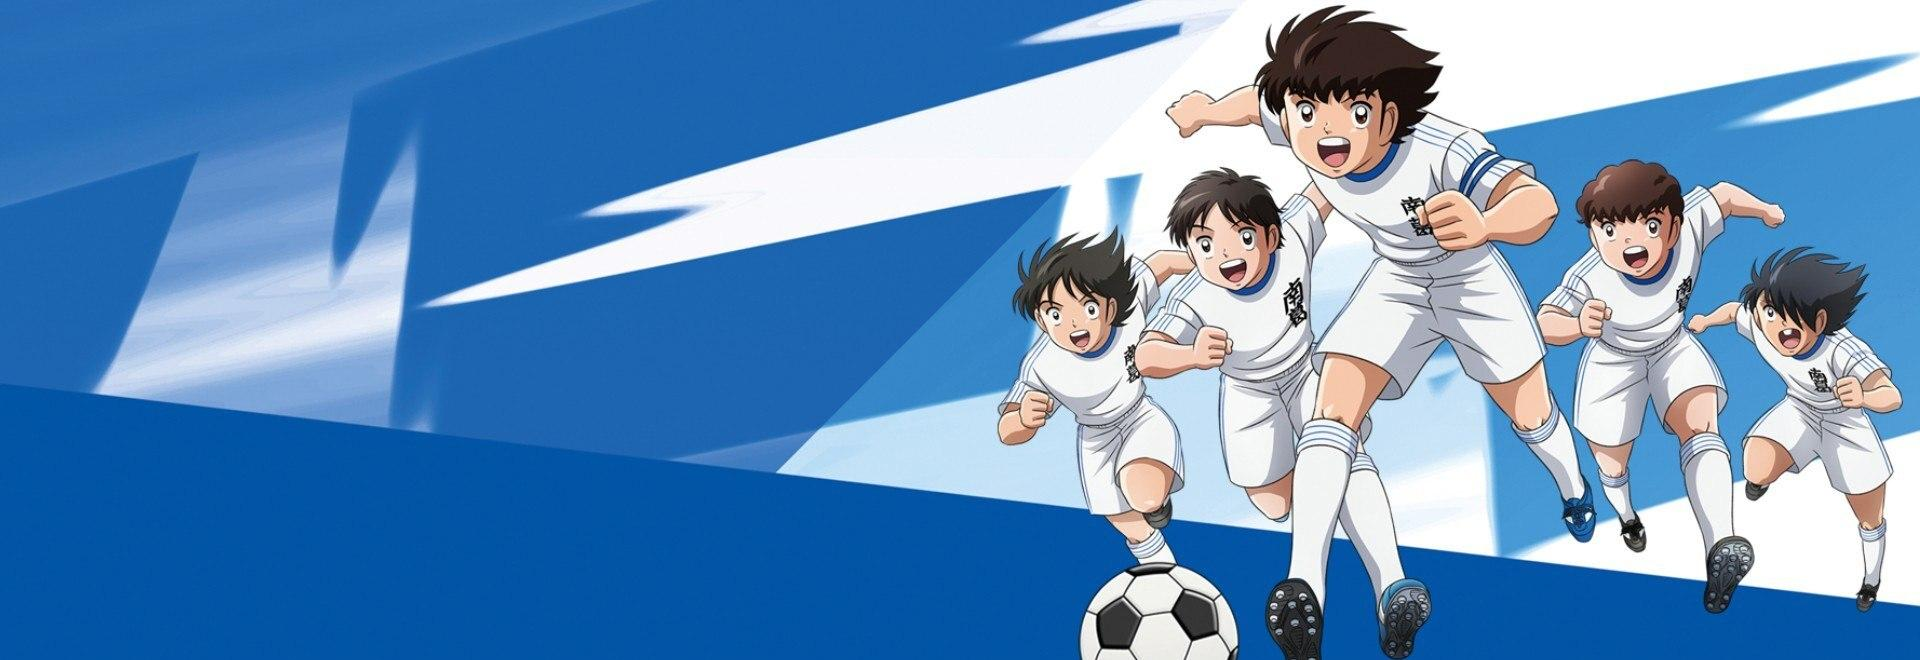 Calcio acrobatico!